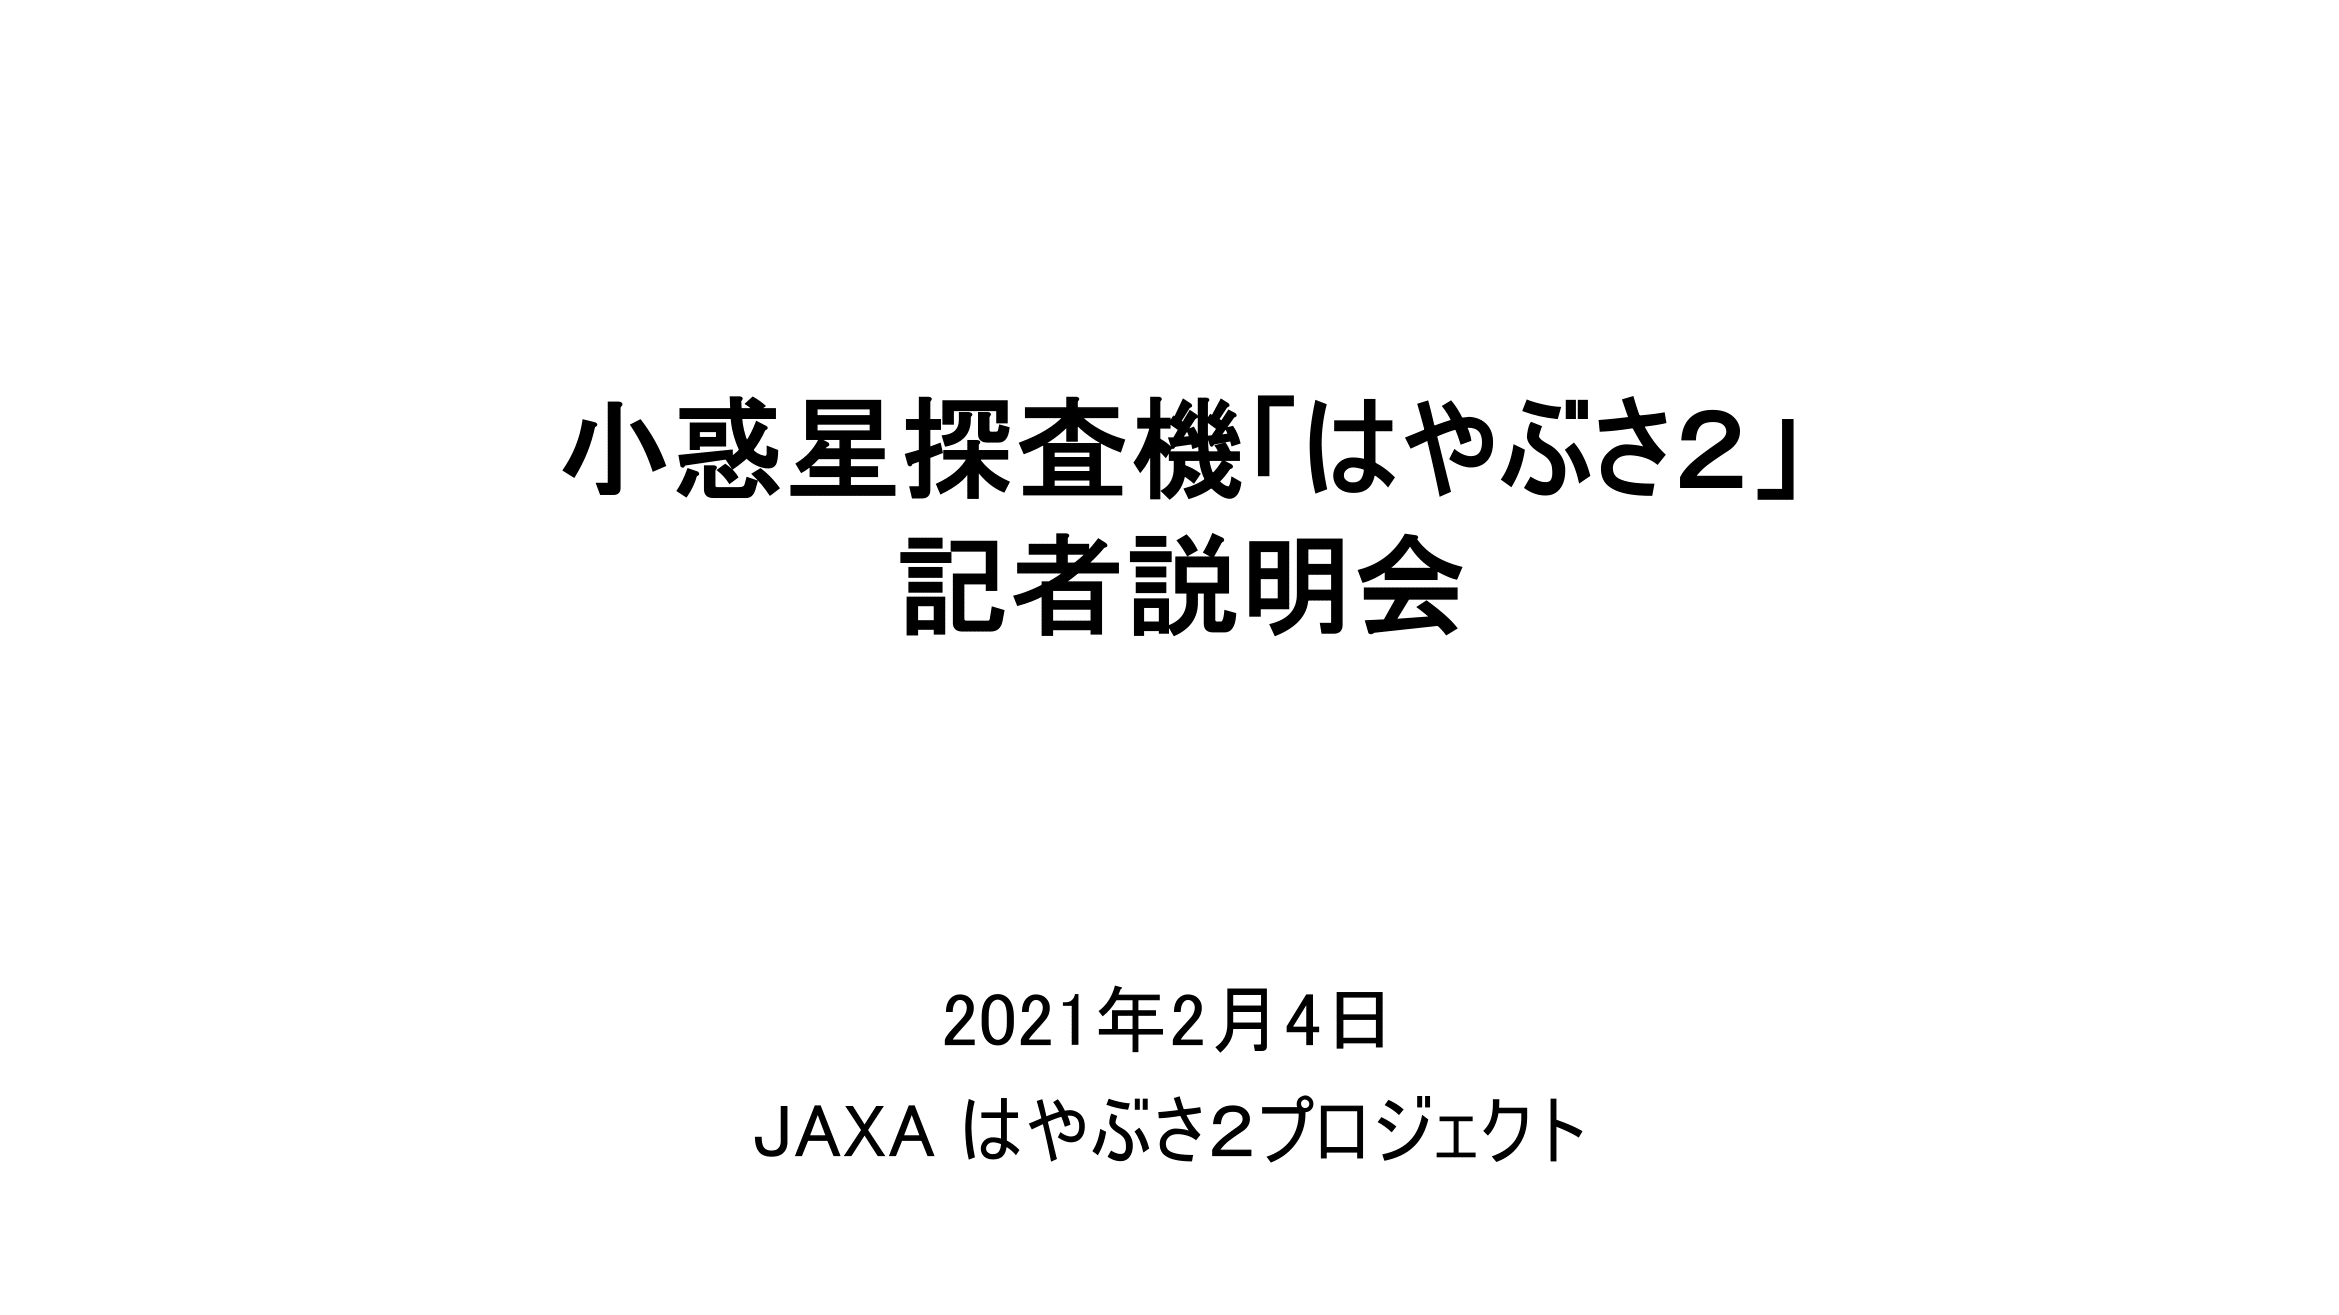 f:id:Imamura:20210204134126p:plain